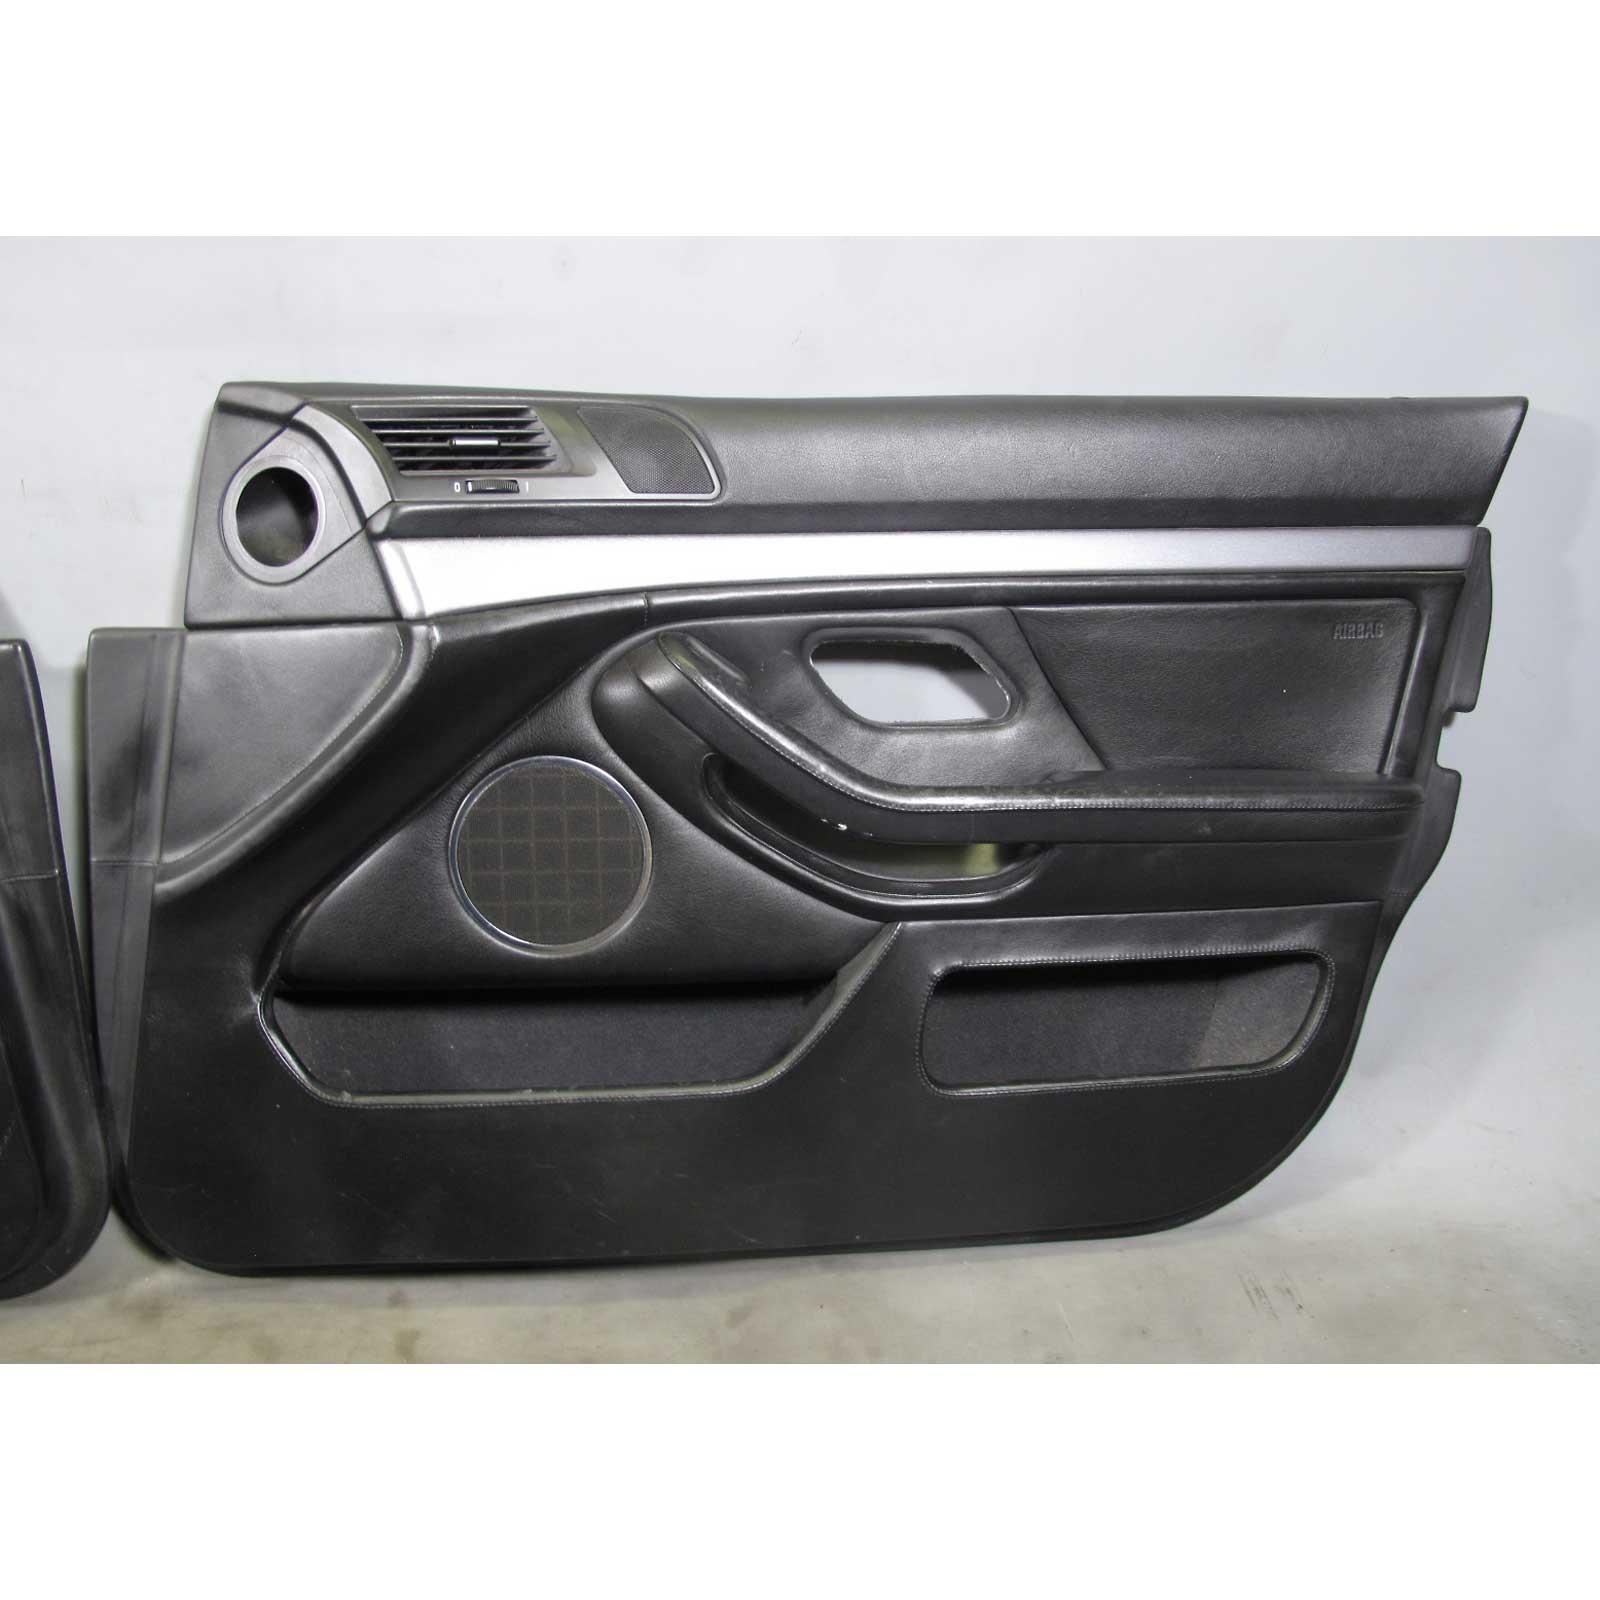 2000 2003 bmw e39 m5 m sedan front interior door panel trim black heritage oe ebay for E39 interior door handle replacement